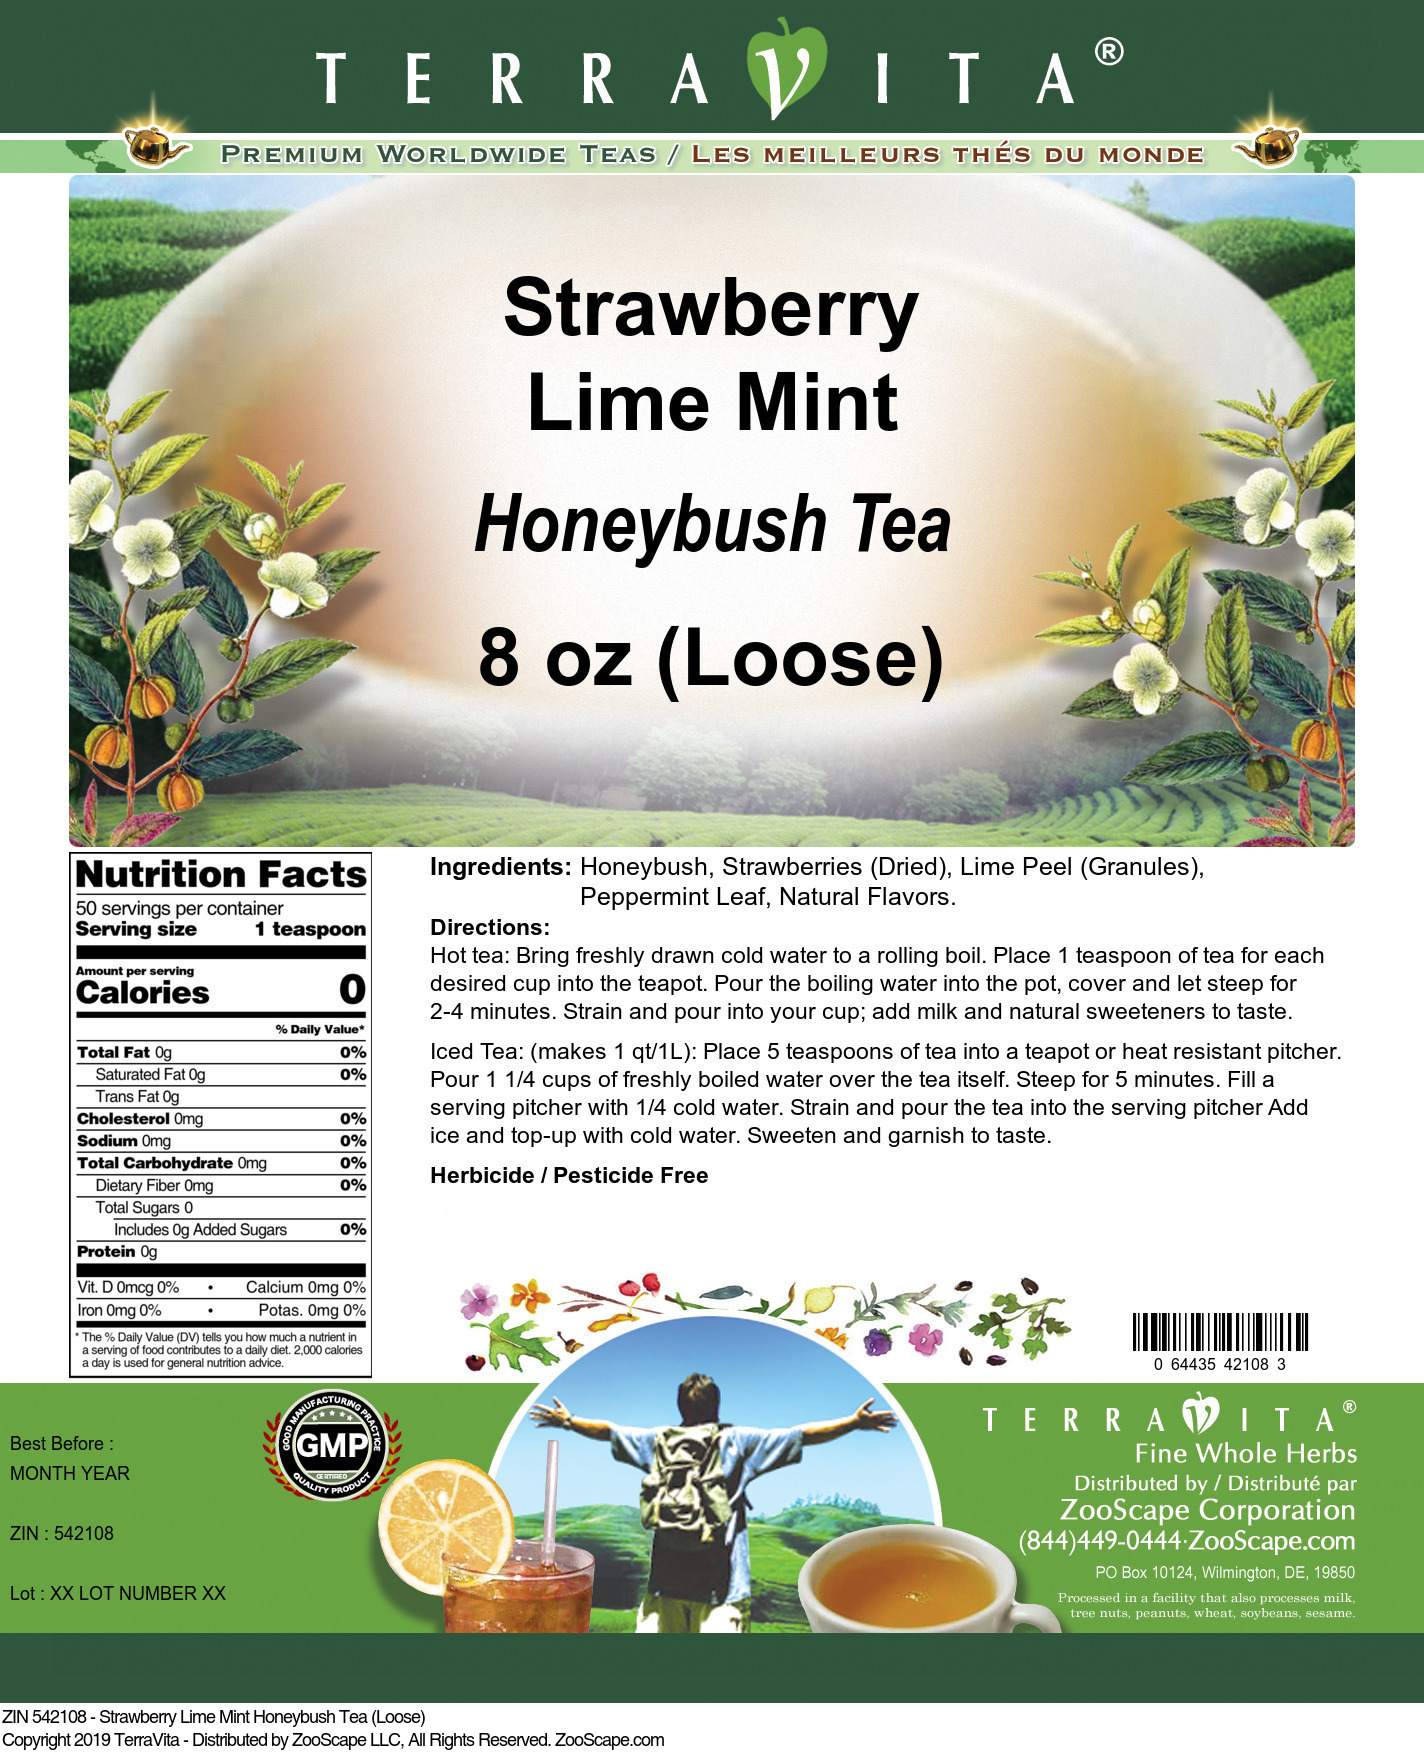 Strawberry Lime Mint Honeybush Tea (Loose)